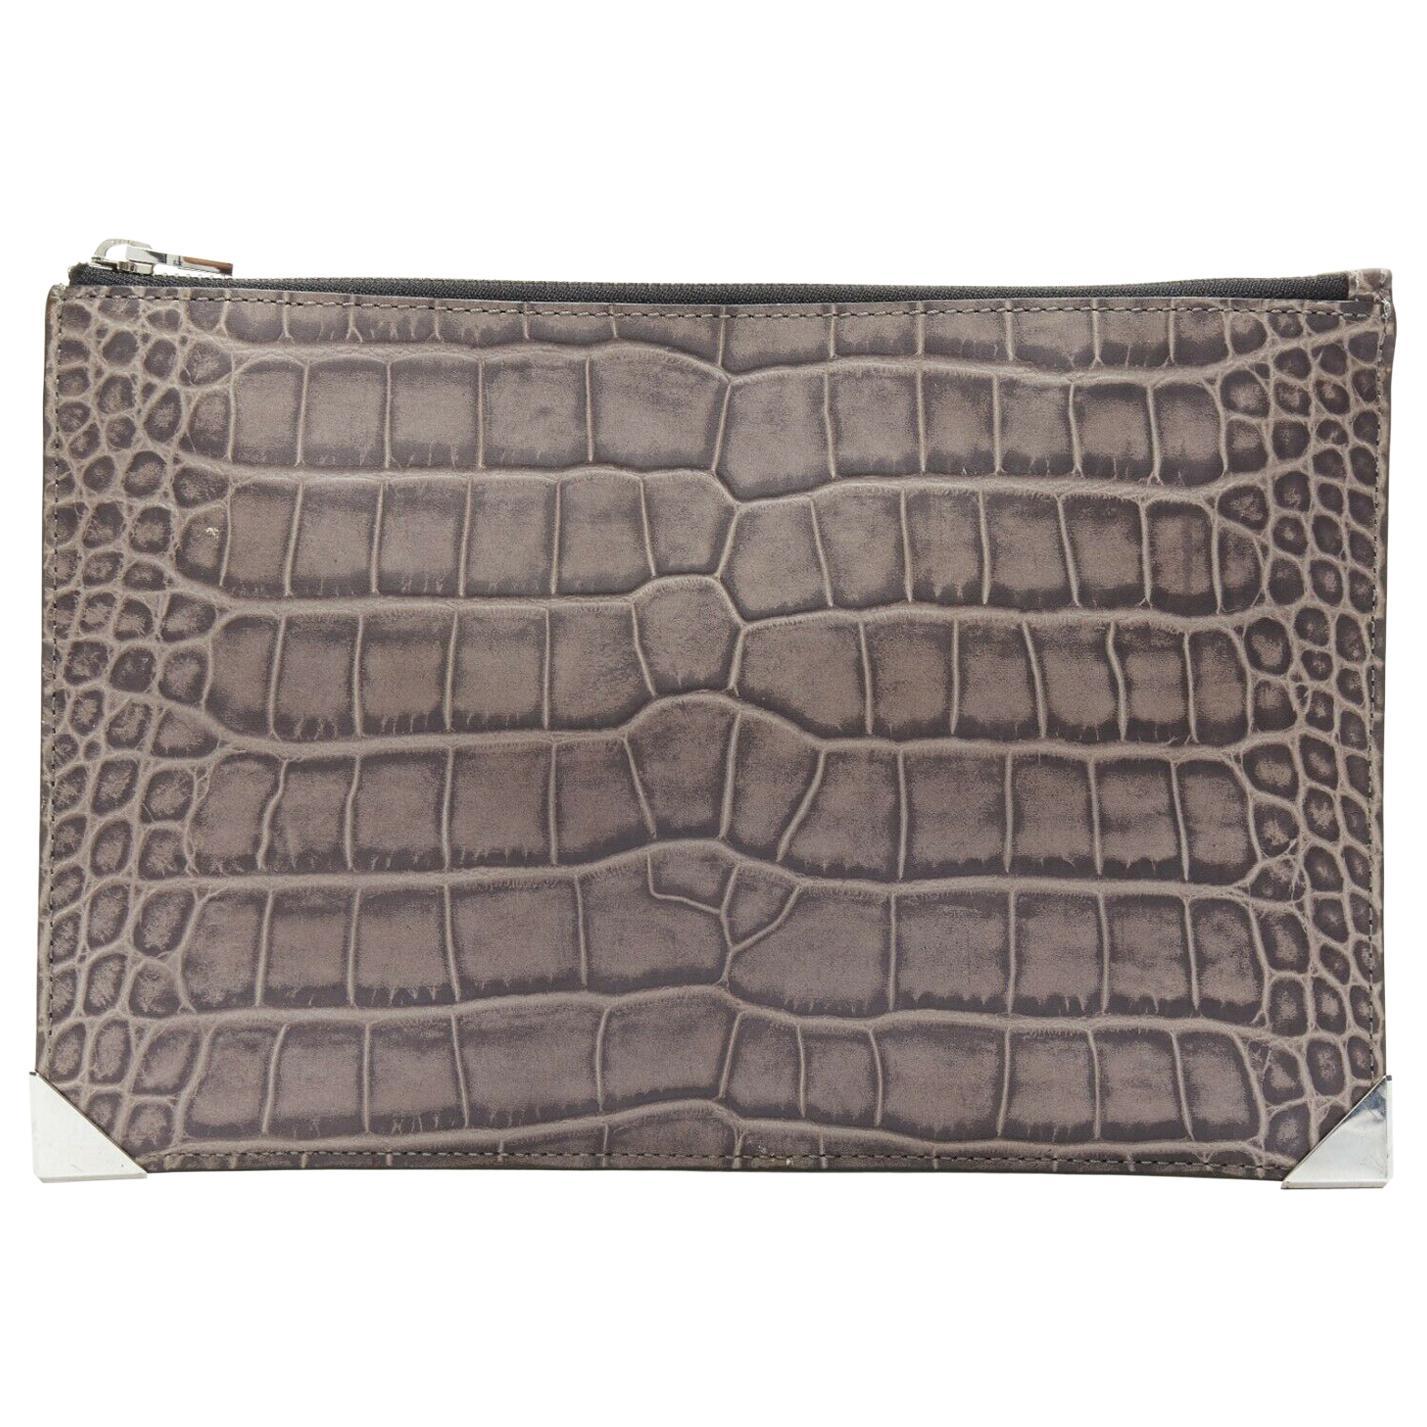 ALEXANDER WANG Prisma clutch leather alligator embossed silver hardware wallet